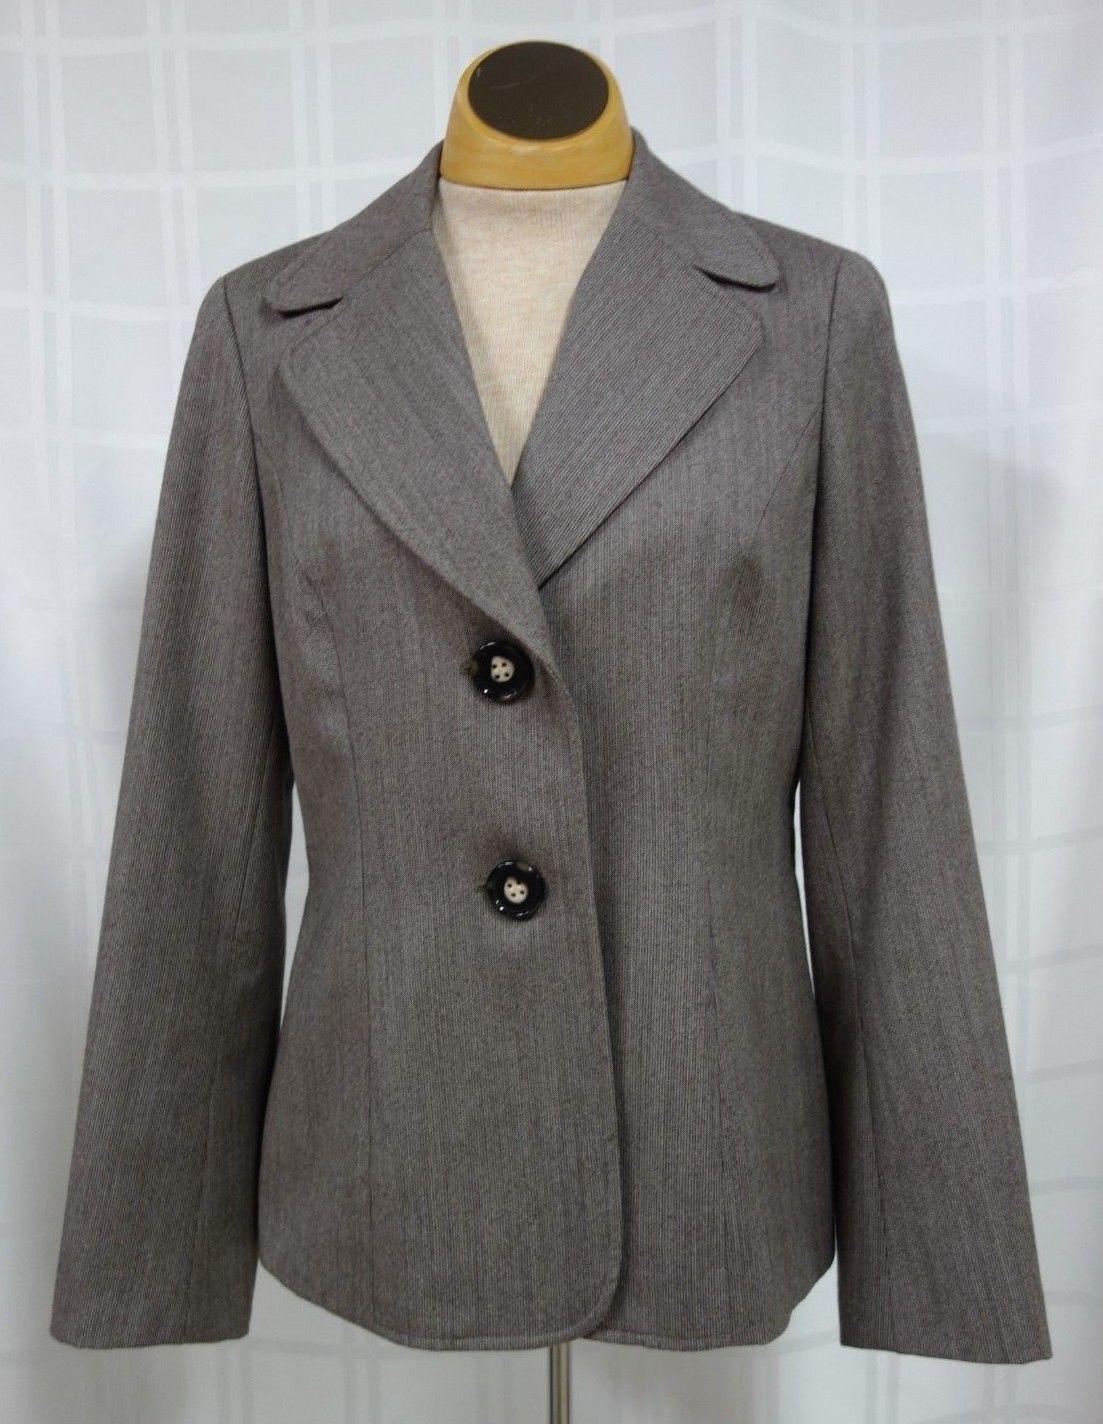 Talbots Womens Business Blazer Size 6 Brown Narrow Stripes 100% Wool Lined